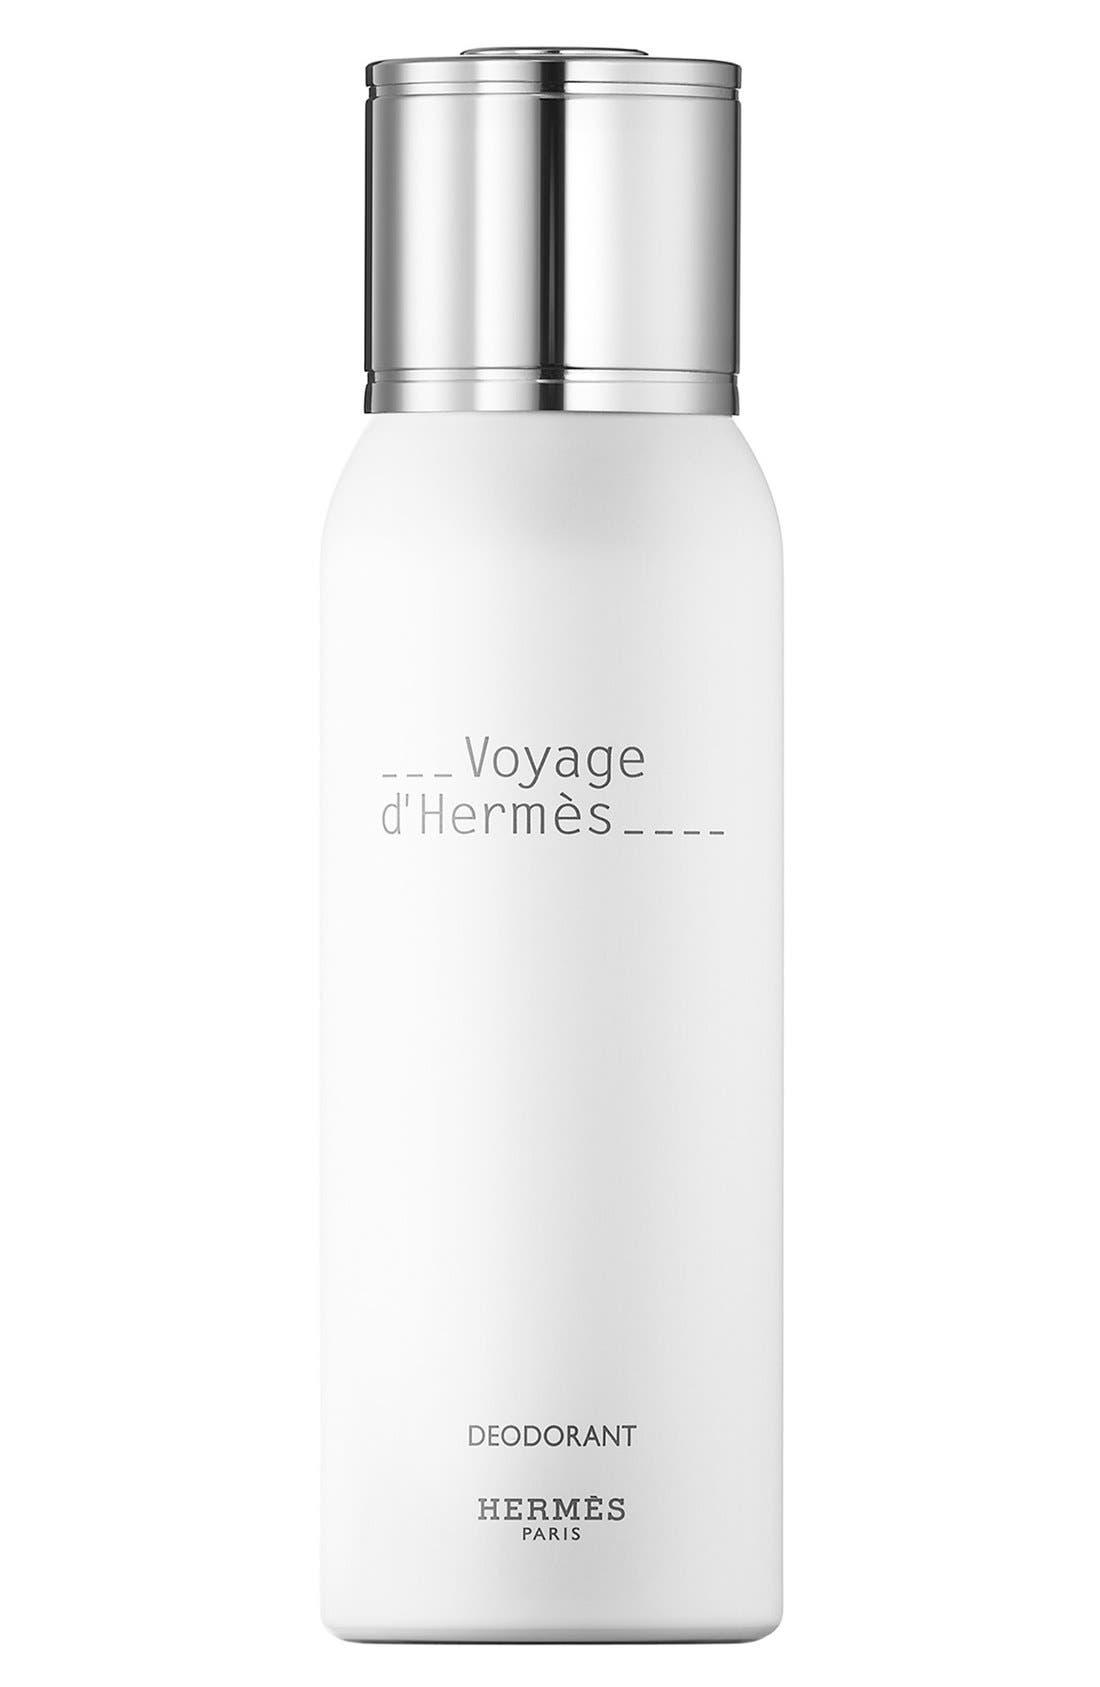 Hermès Voyage d'Hermès - Deodorant natural spray,                             Main thumbnail 1, color,                             000